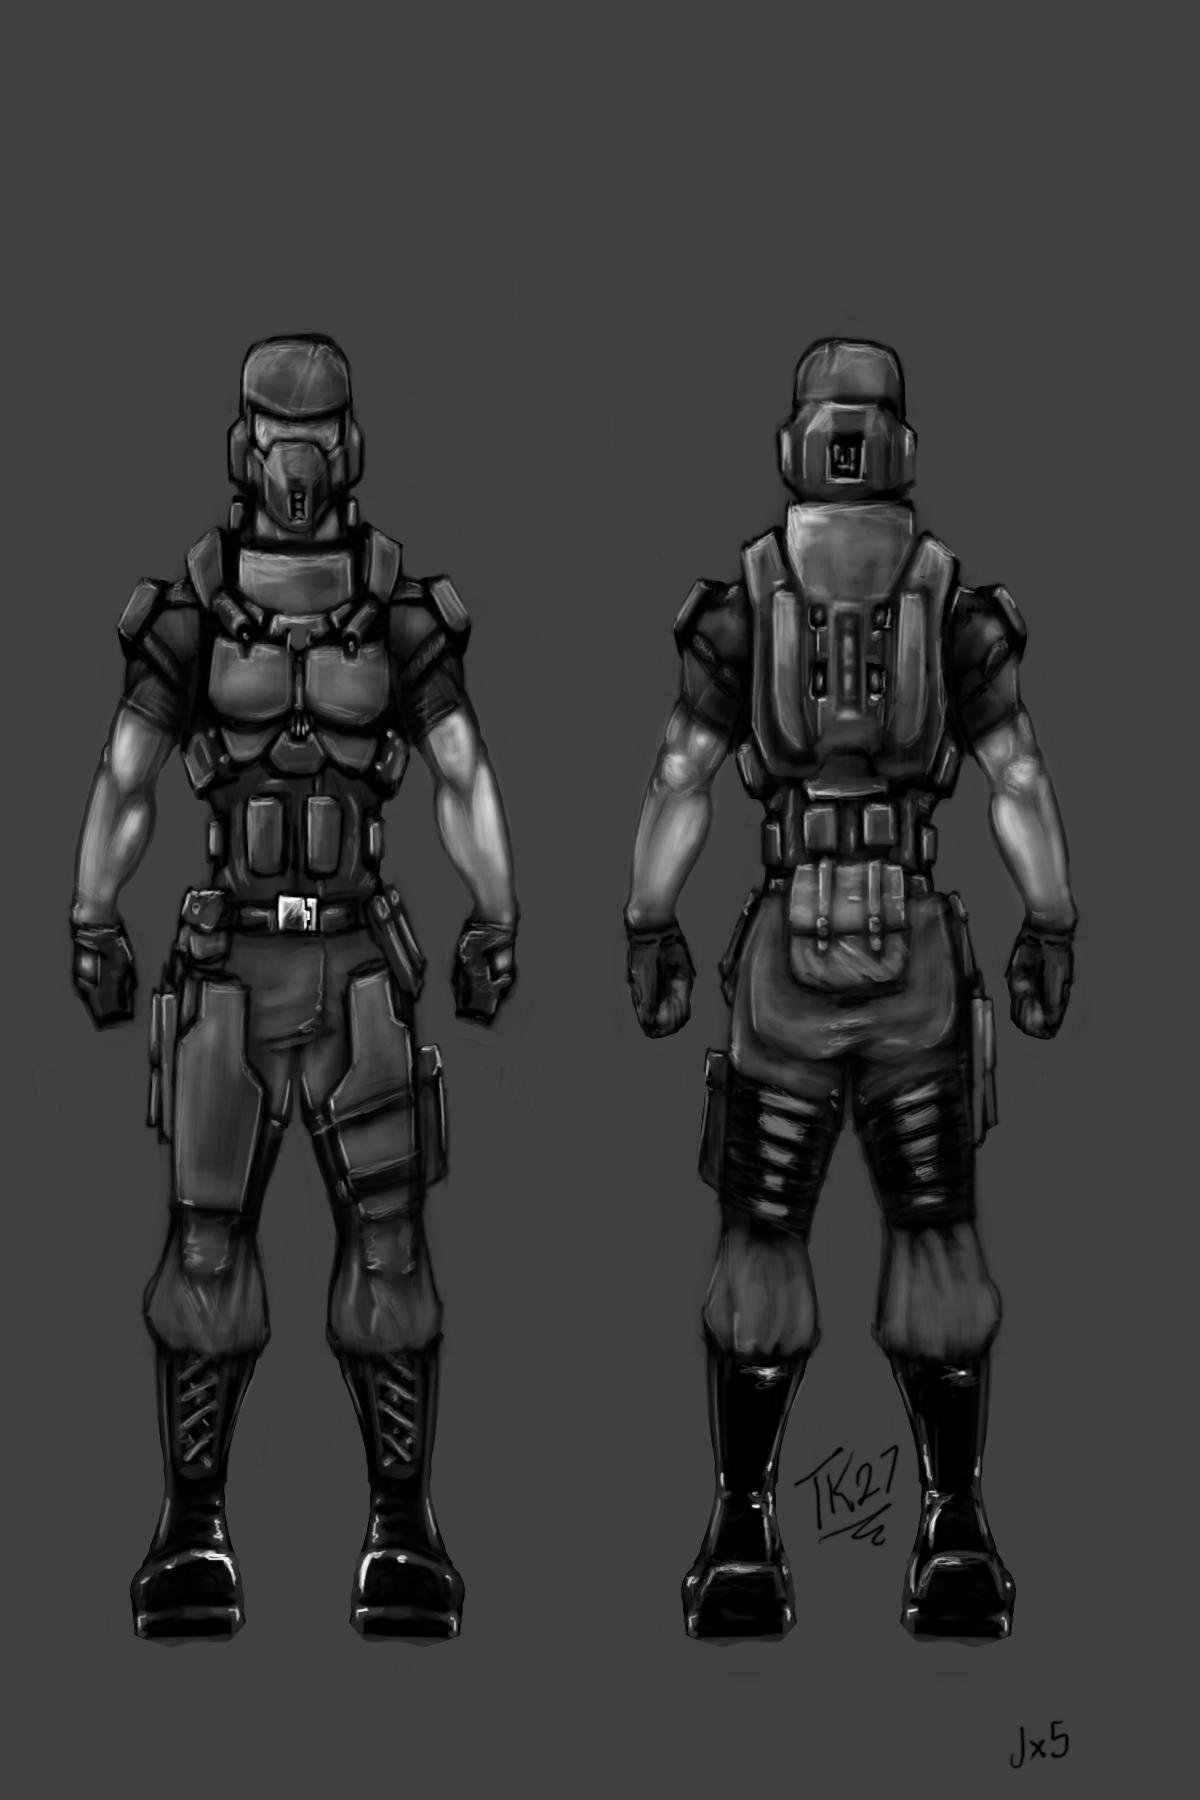 Jx5 'Marine' Concept